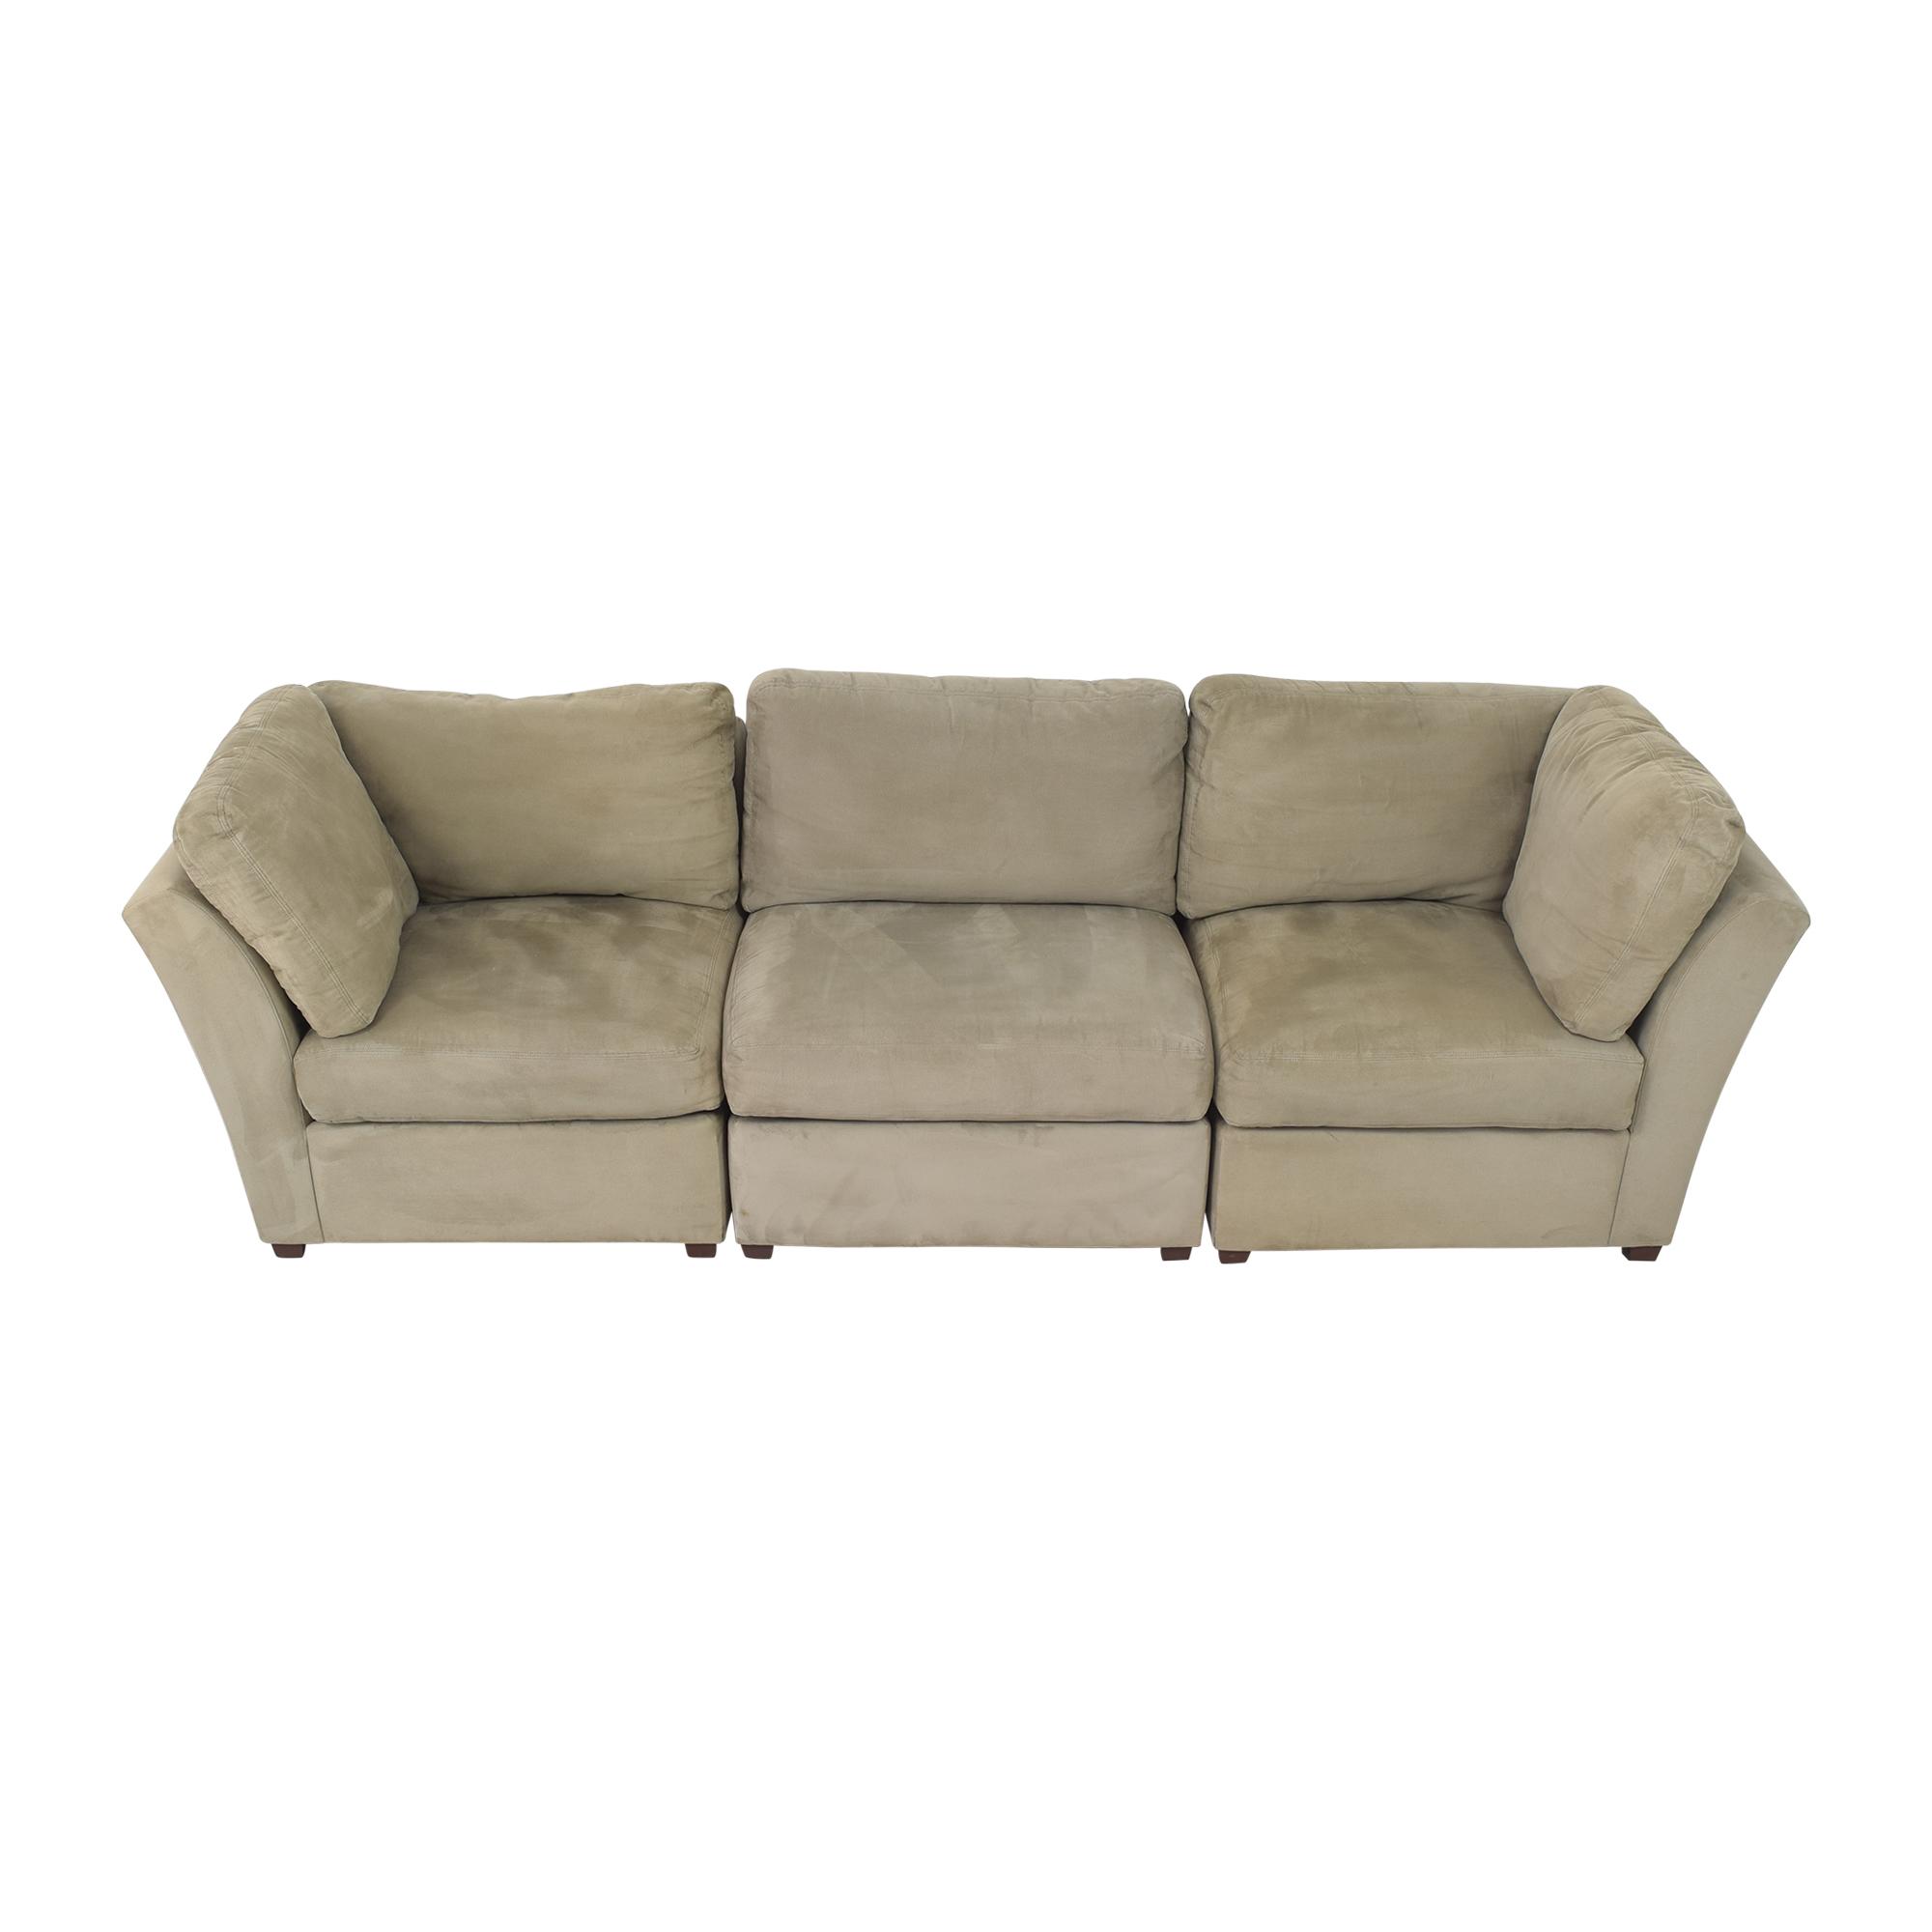 Raymour & Flanigan Raymour & Flanigan Modular Sofa discount